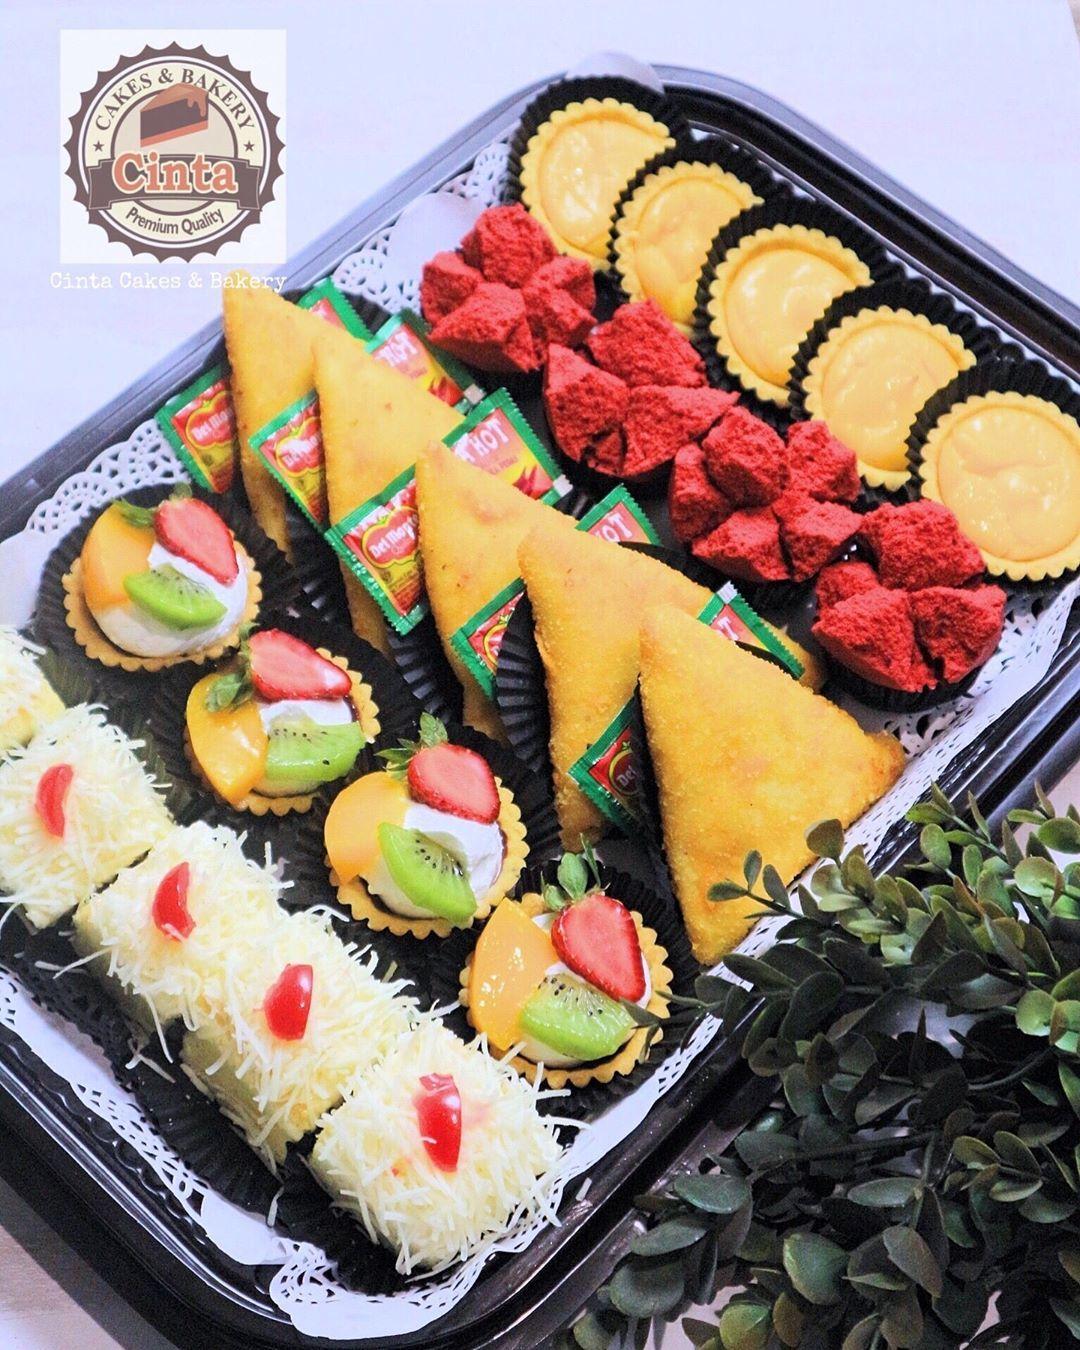 Cinta Cakes Bakery Bjonegoro Di Instagram Kue Nampan Made By Order Info Order Wa Sms 085330321090 Bbm 58283 Makanan Dan Minuman Makanan Nampan